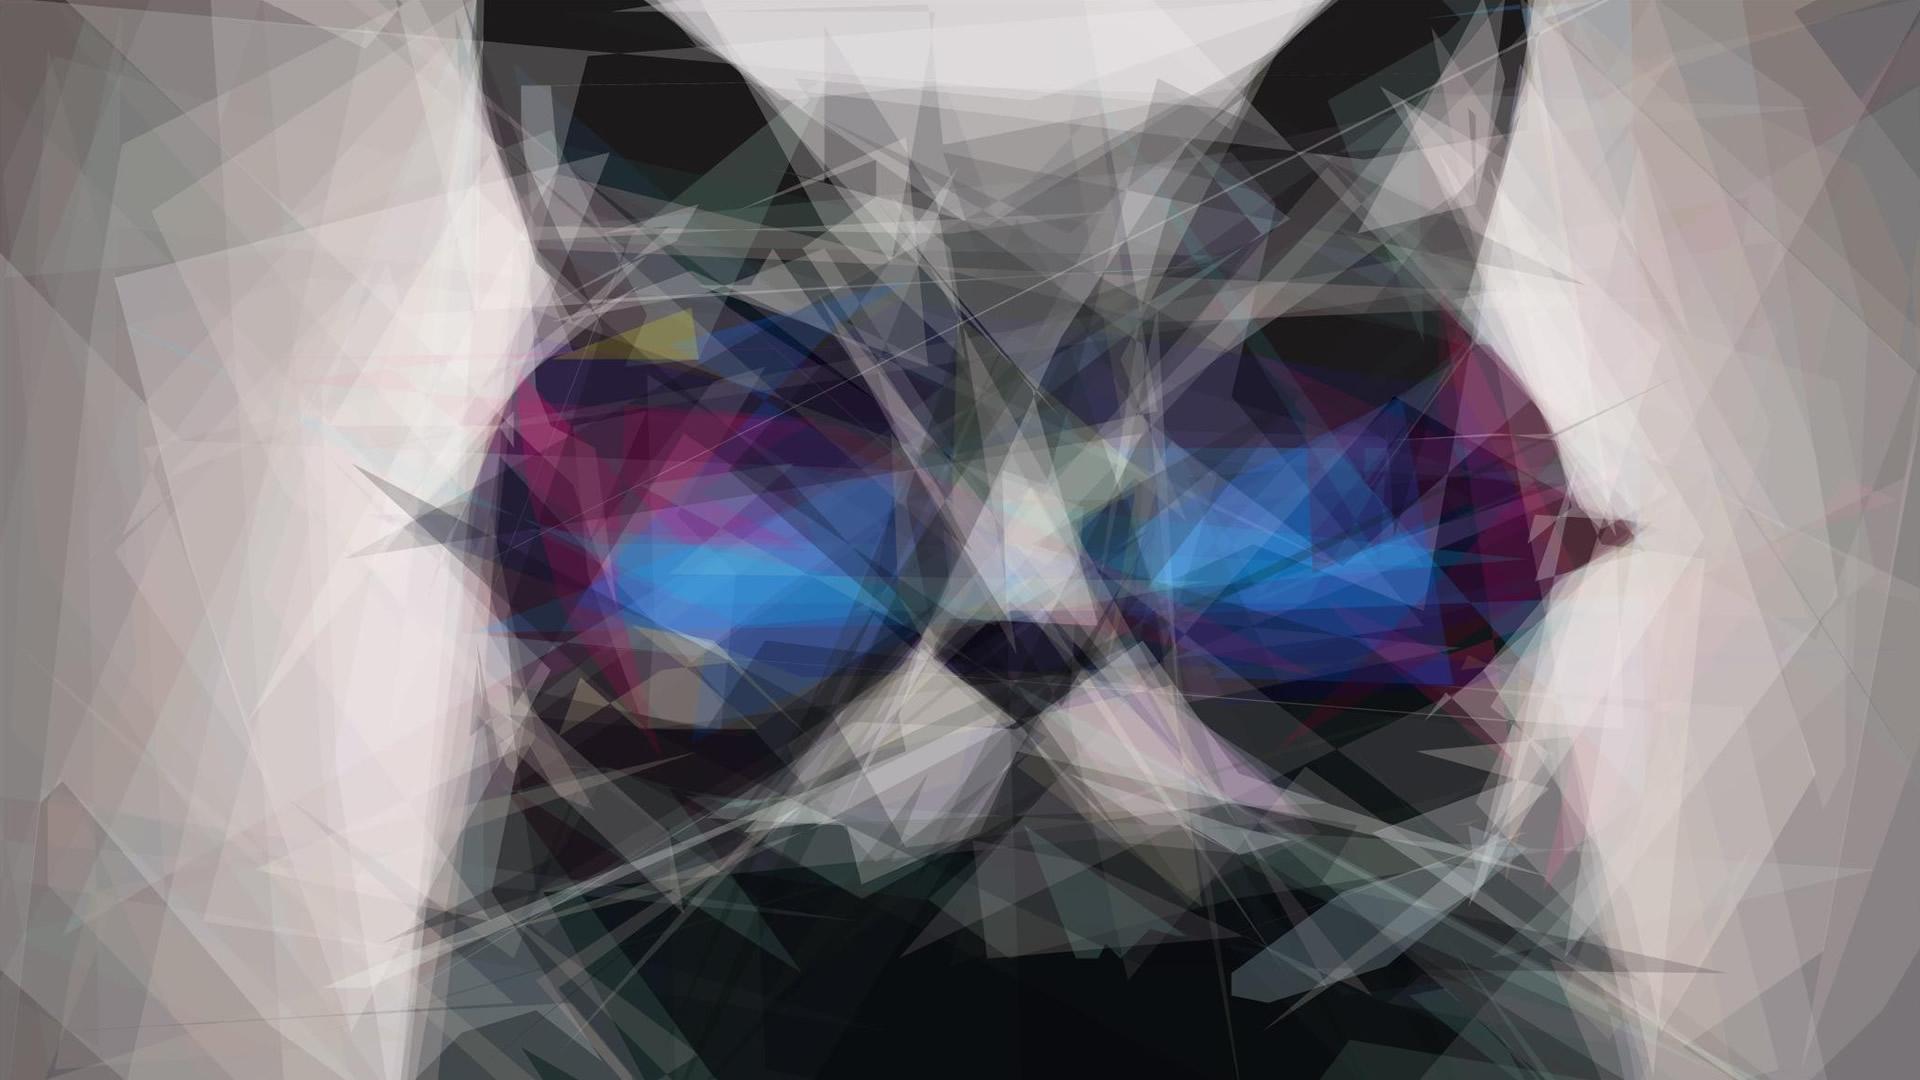 Cat in the Glasses HD Wallpaper FullHDWpp   Full HD Wallpapers 1920x1080